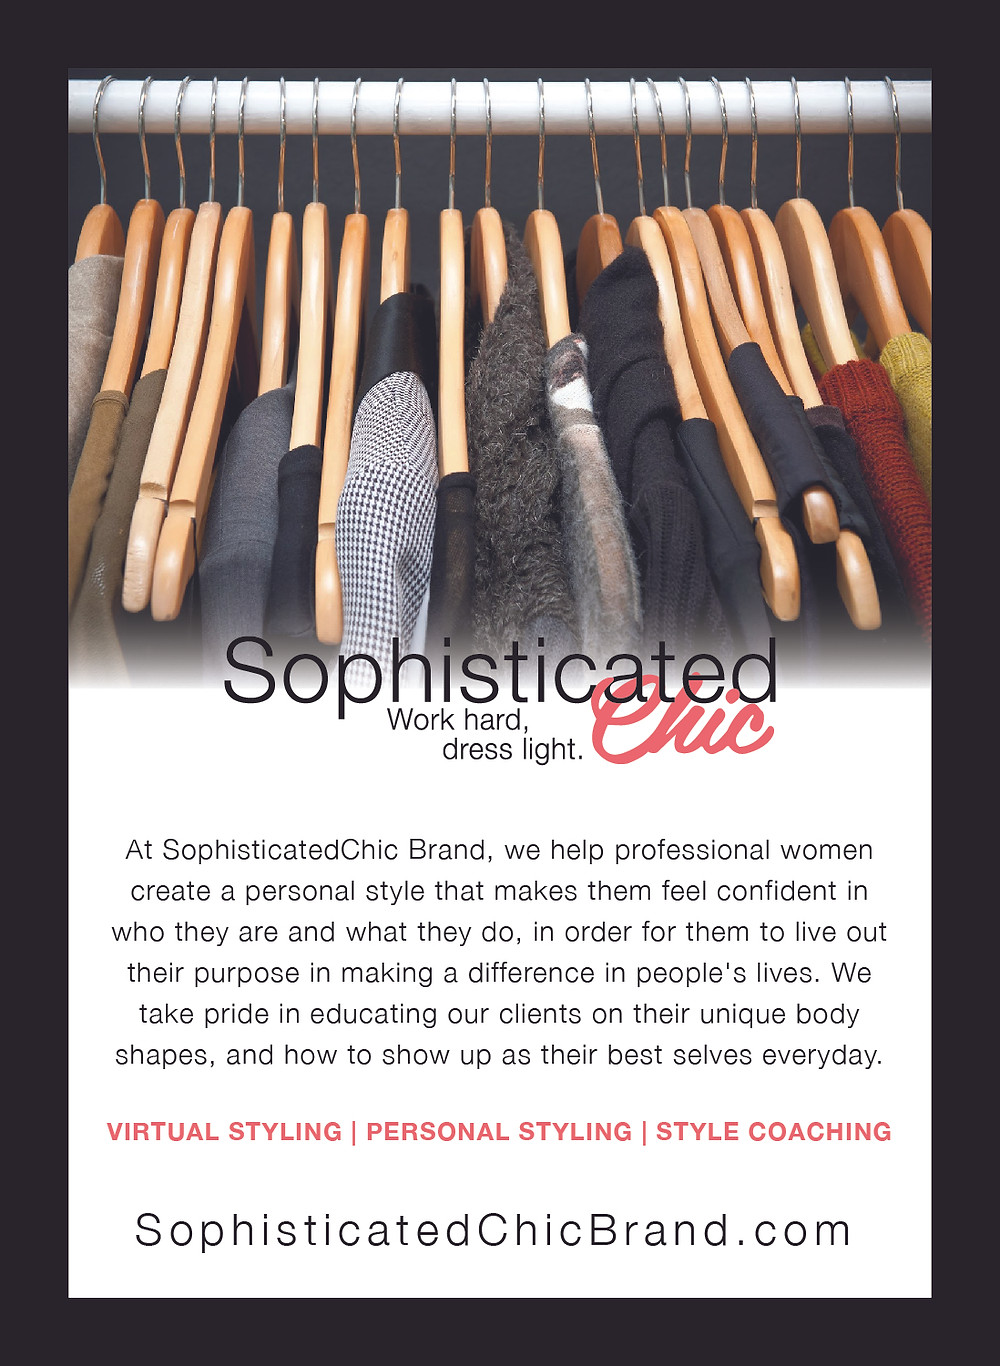 Ad SophisticatedChic Brand